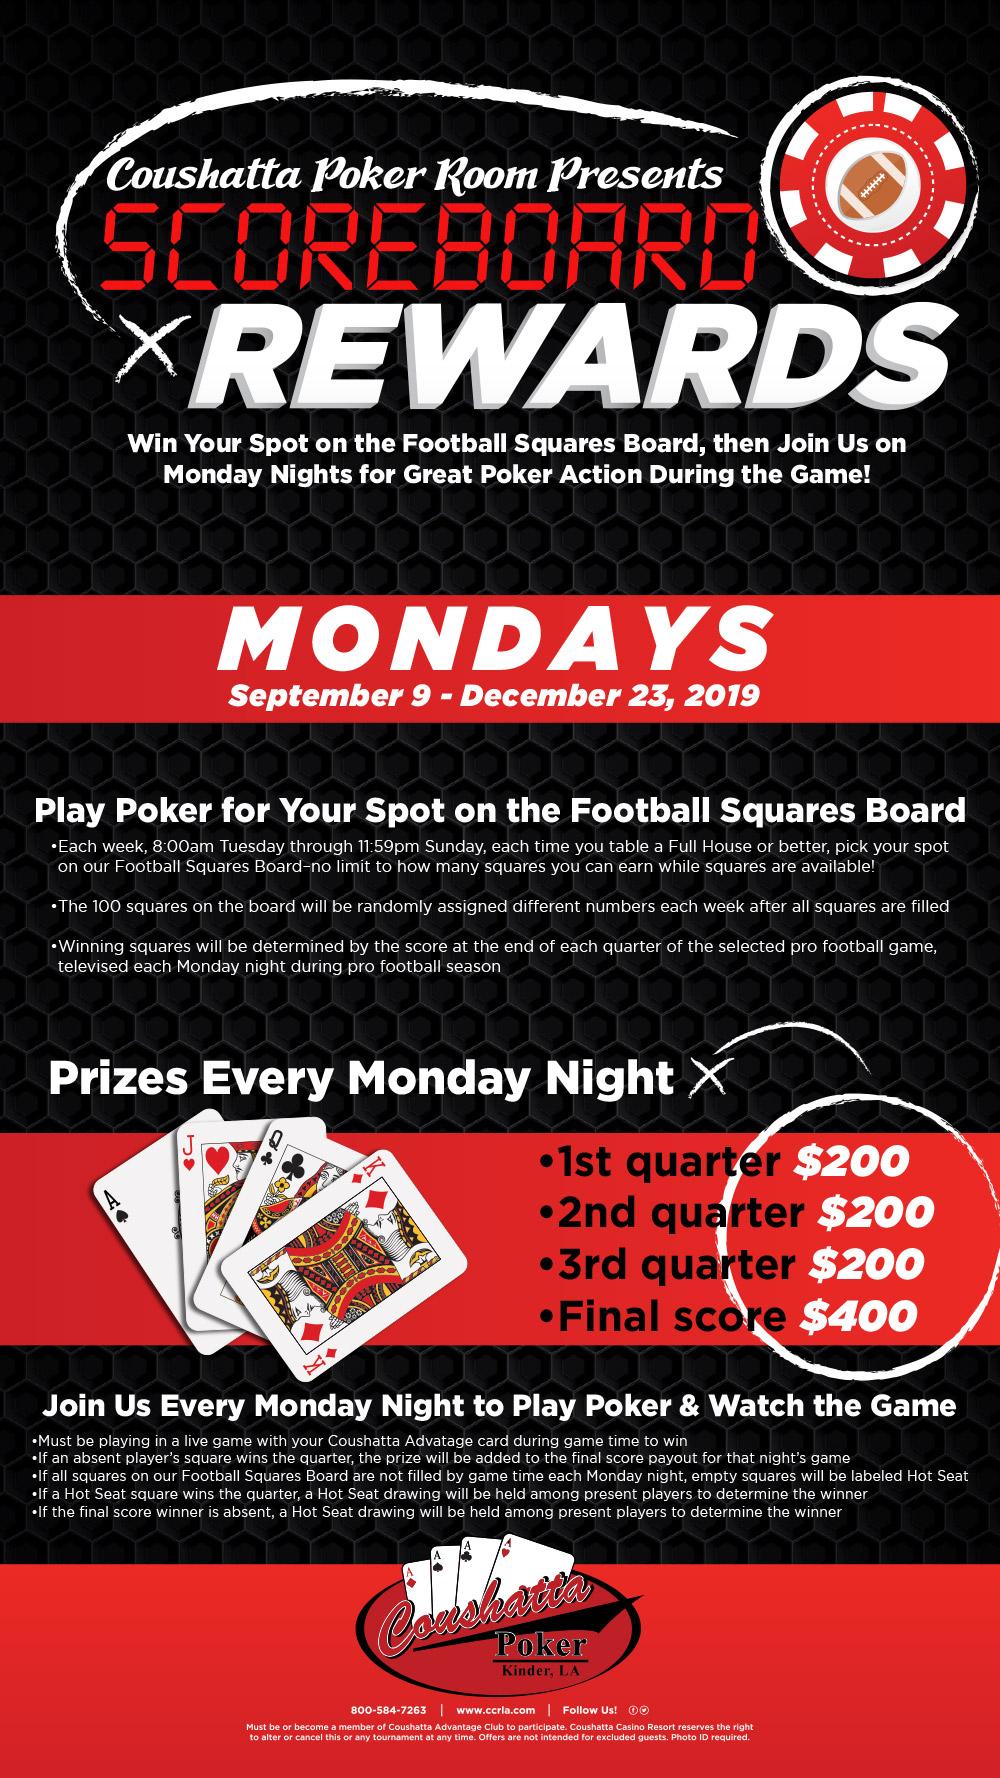 Poker Scoreboard Rewards - Coushatta Casino Resort